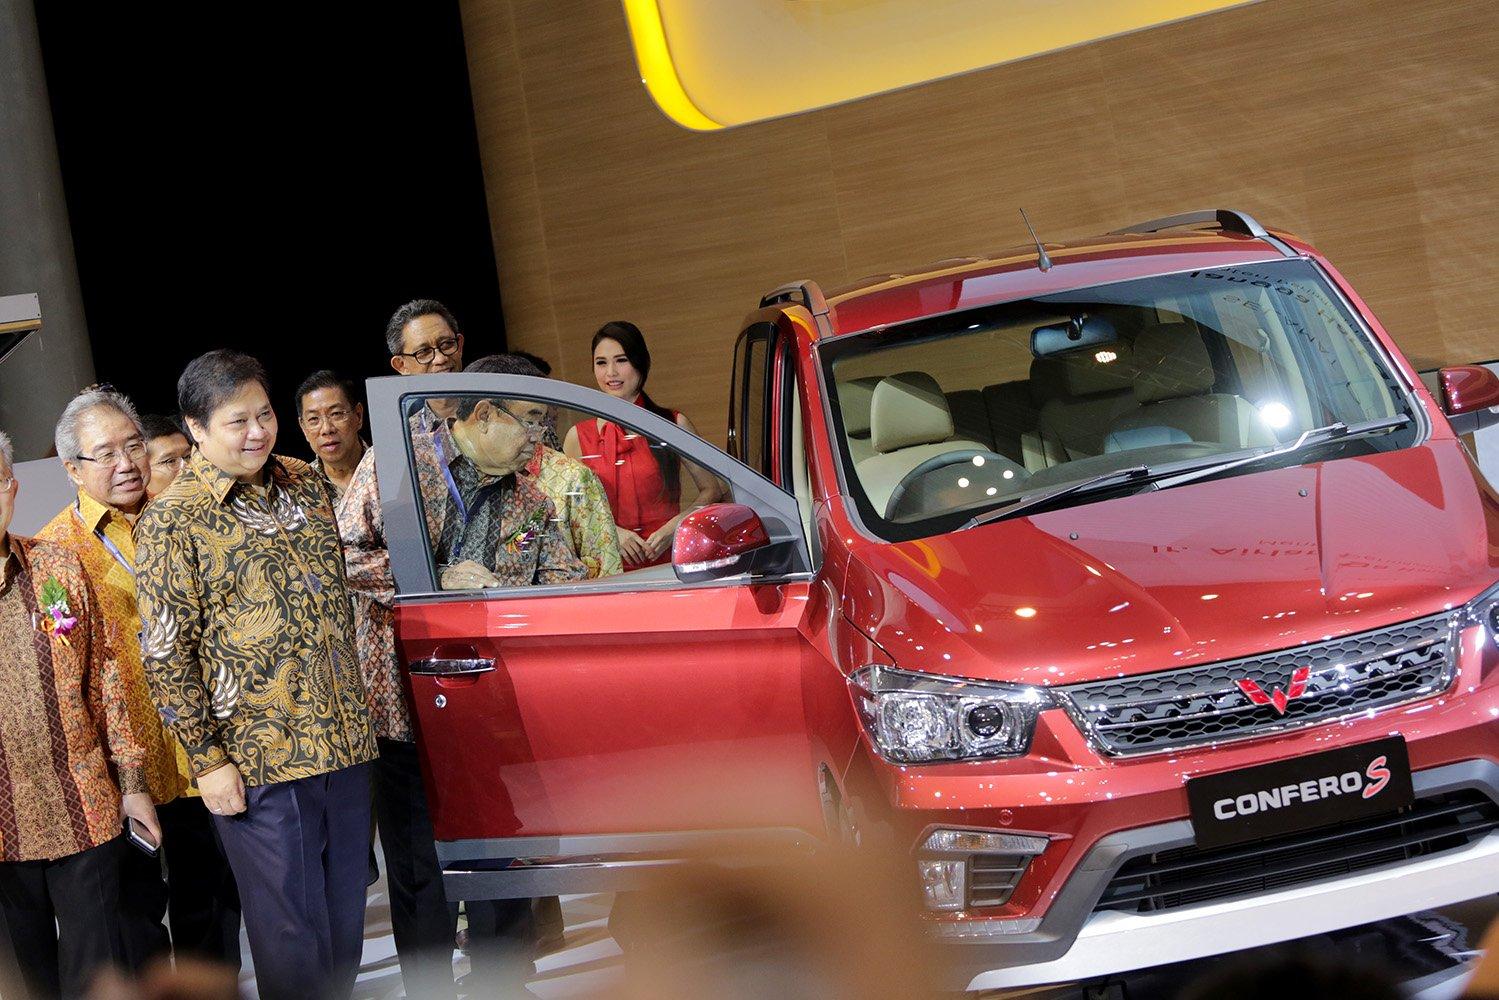 Menteri Perindustrian Airlangga Hartarto meninjau stand pamer mobil Wuling pada acara GIIAS 2017 di Tangerang, Banten, Kamis (10/8).